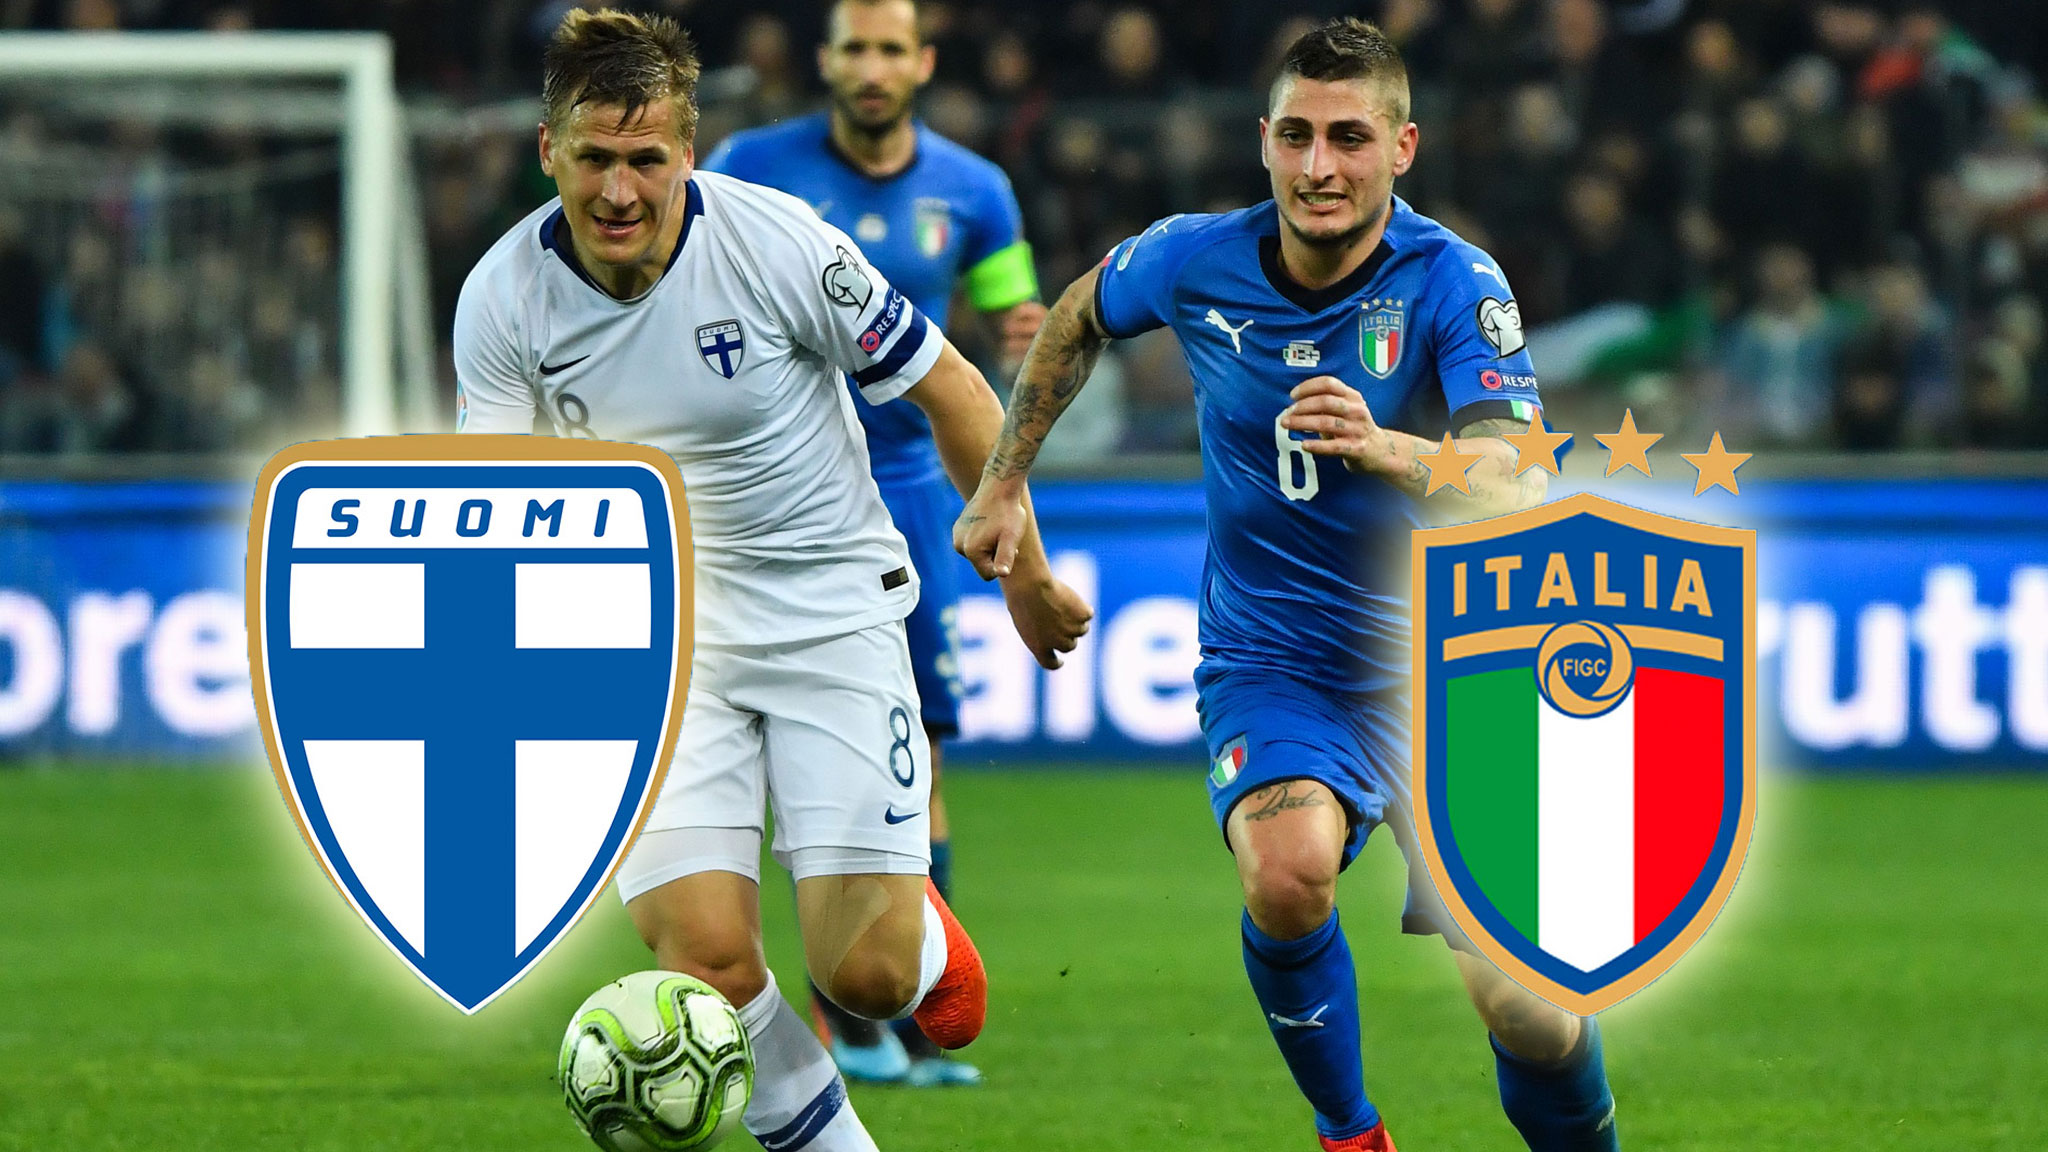 Finnland Vs Italien Heute Live Im Tv Und Im Live Stream